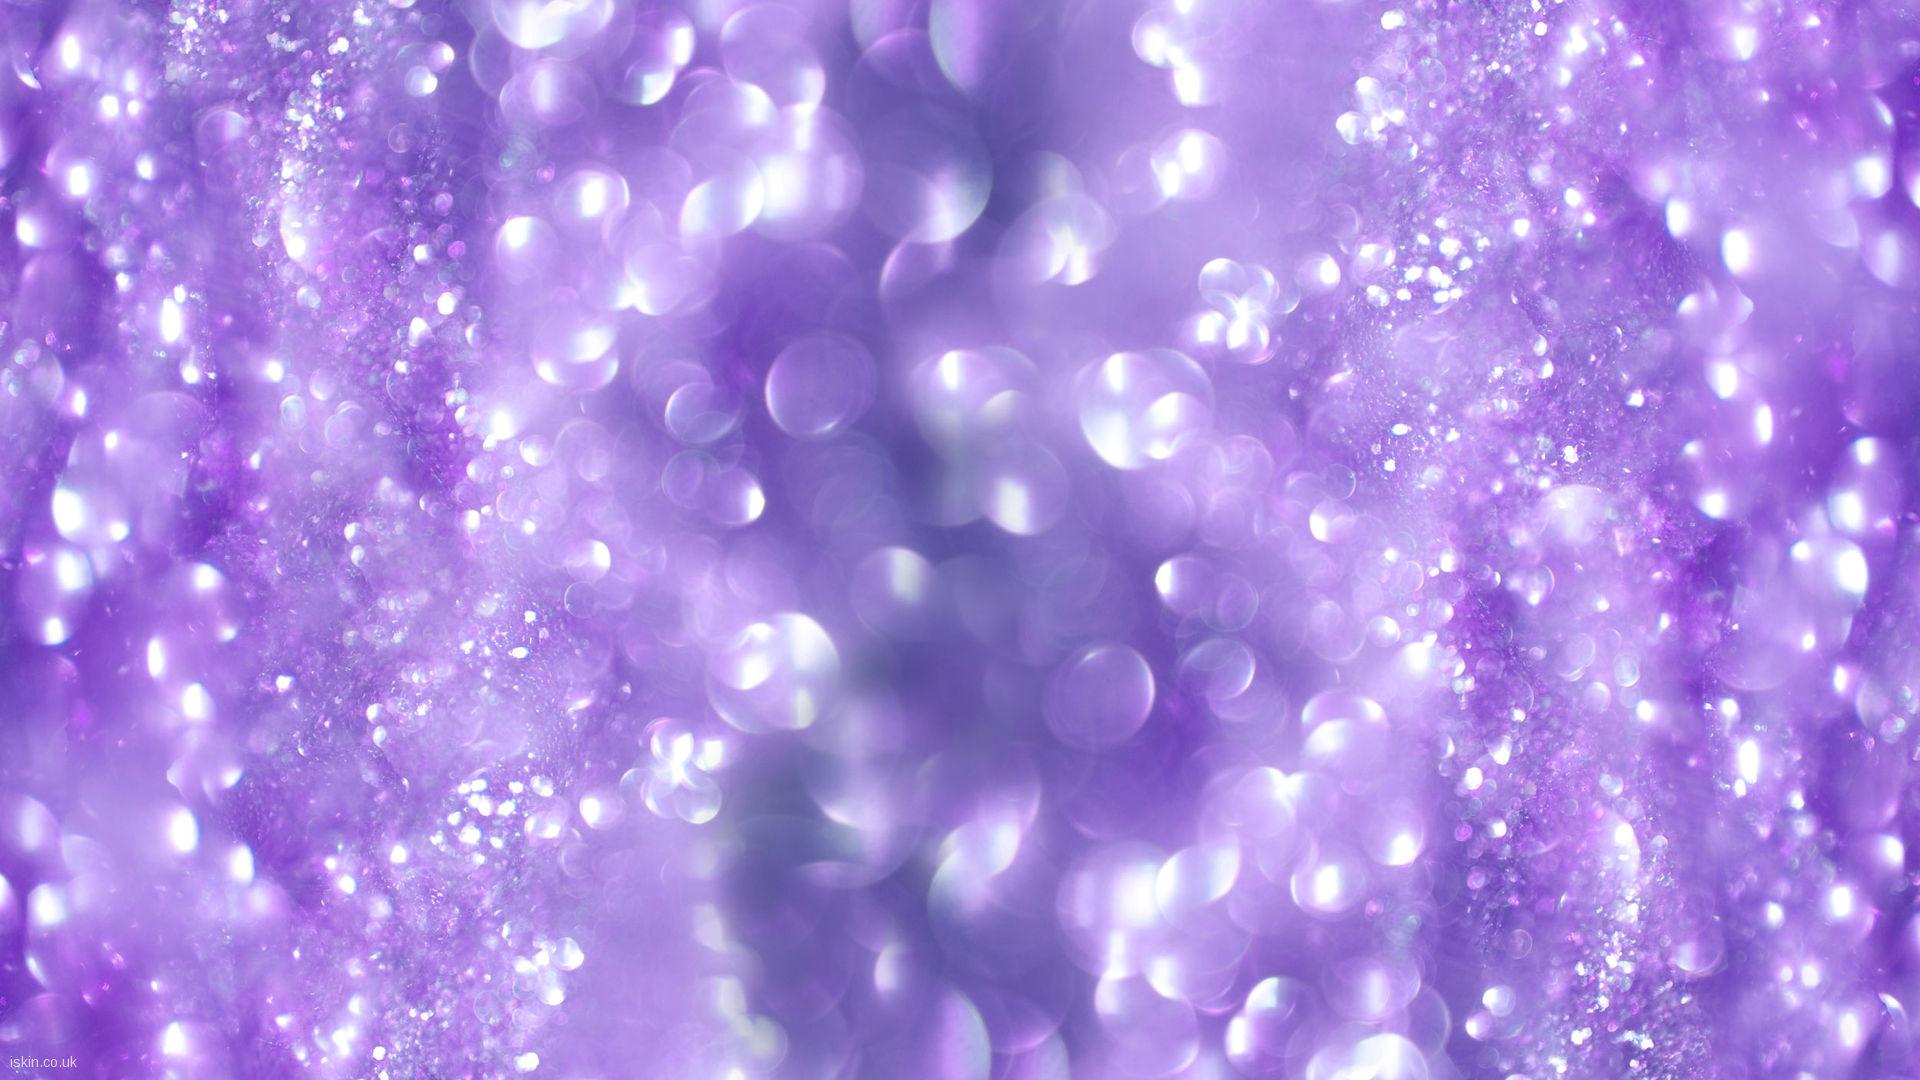 Glitter Wallpaper for Walls UK | Download HD Wallpapers